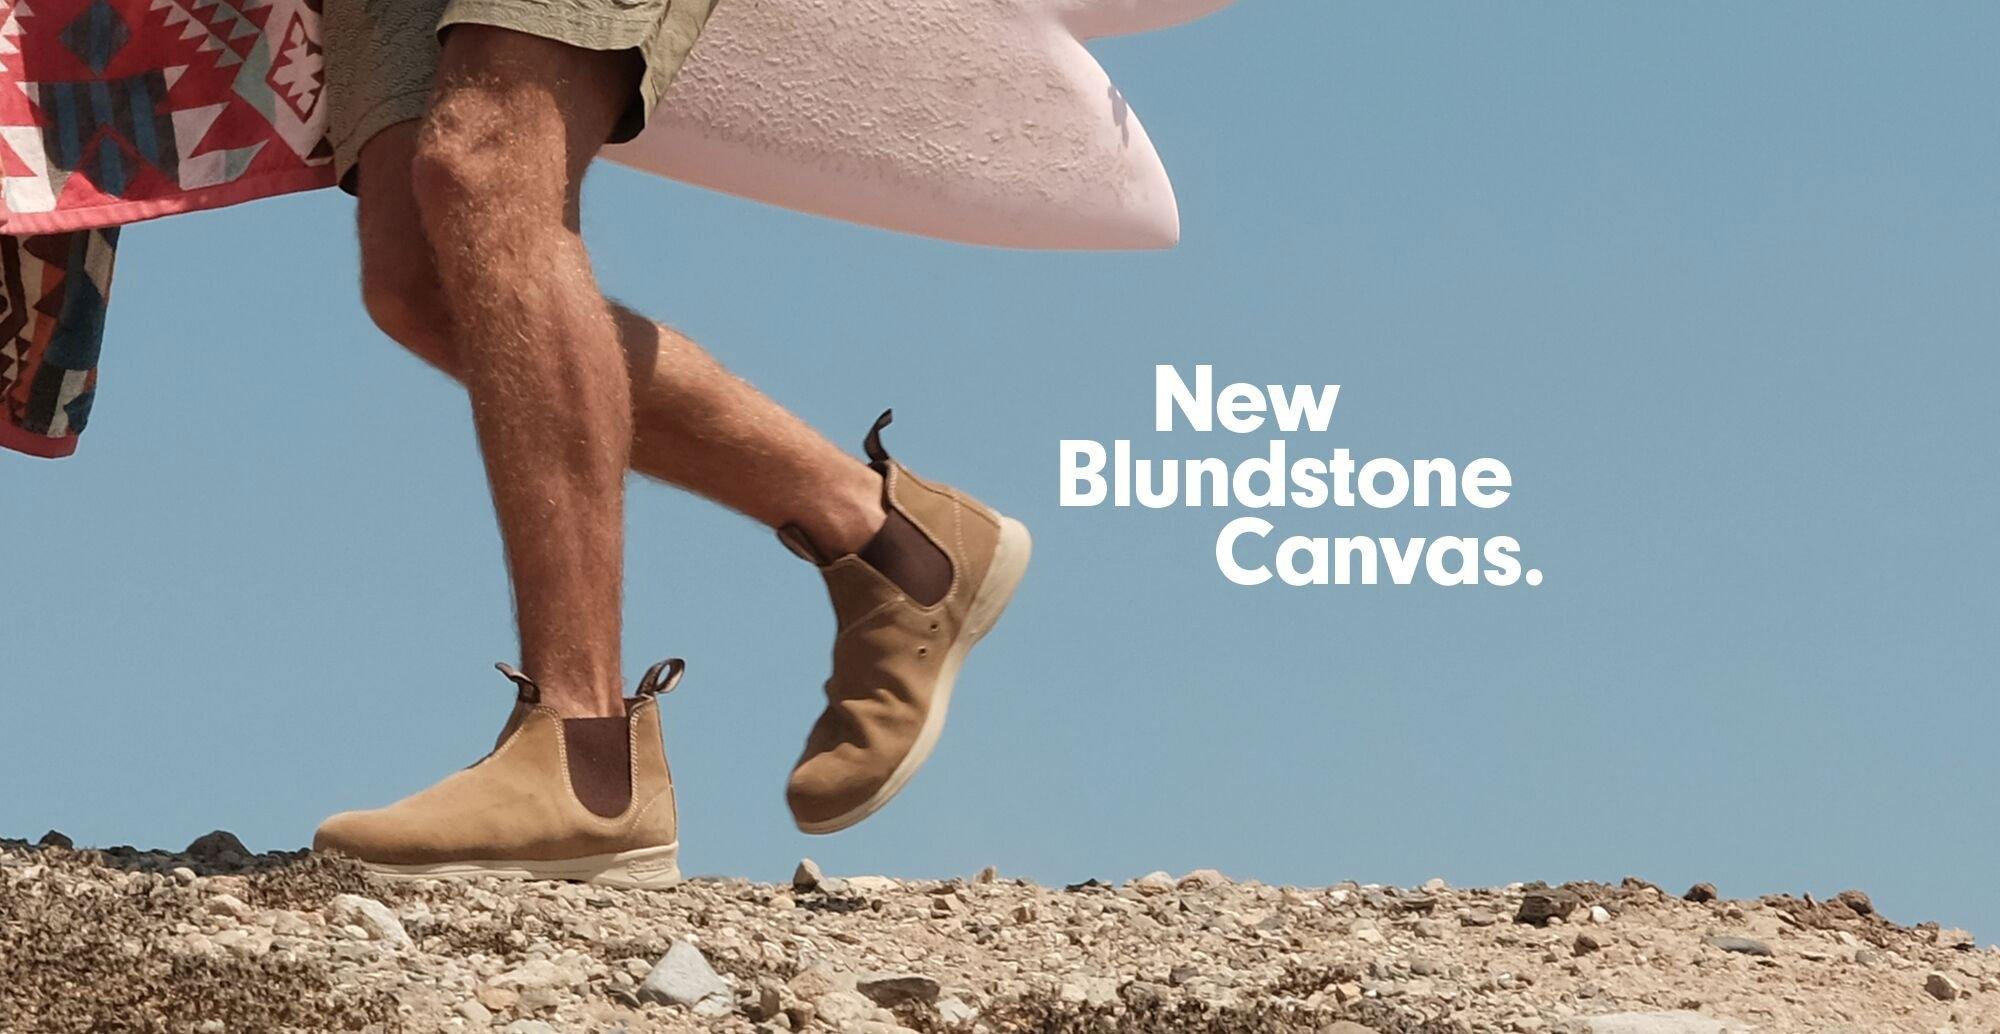 brand new 86db4 ba039 Stivaletti Blundstone: scopri tutti i modelli